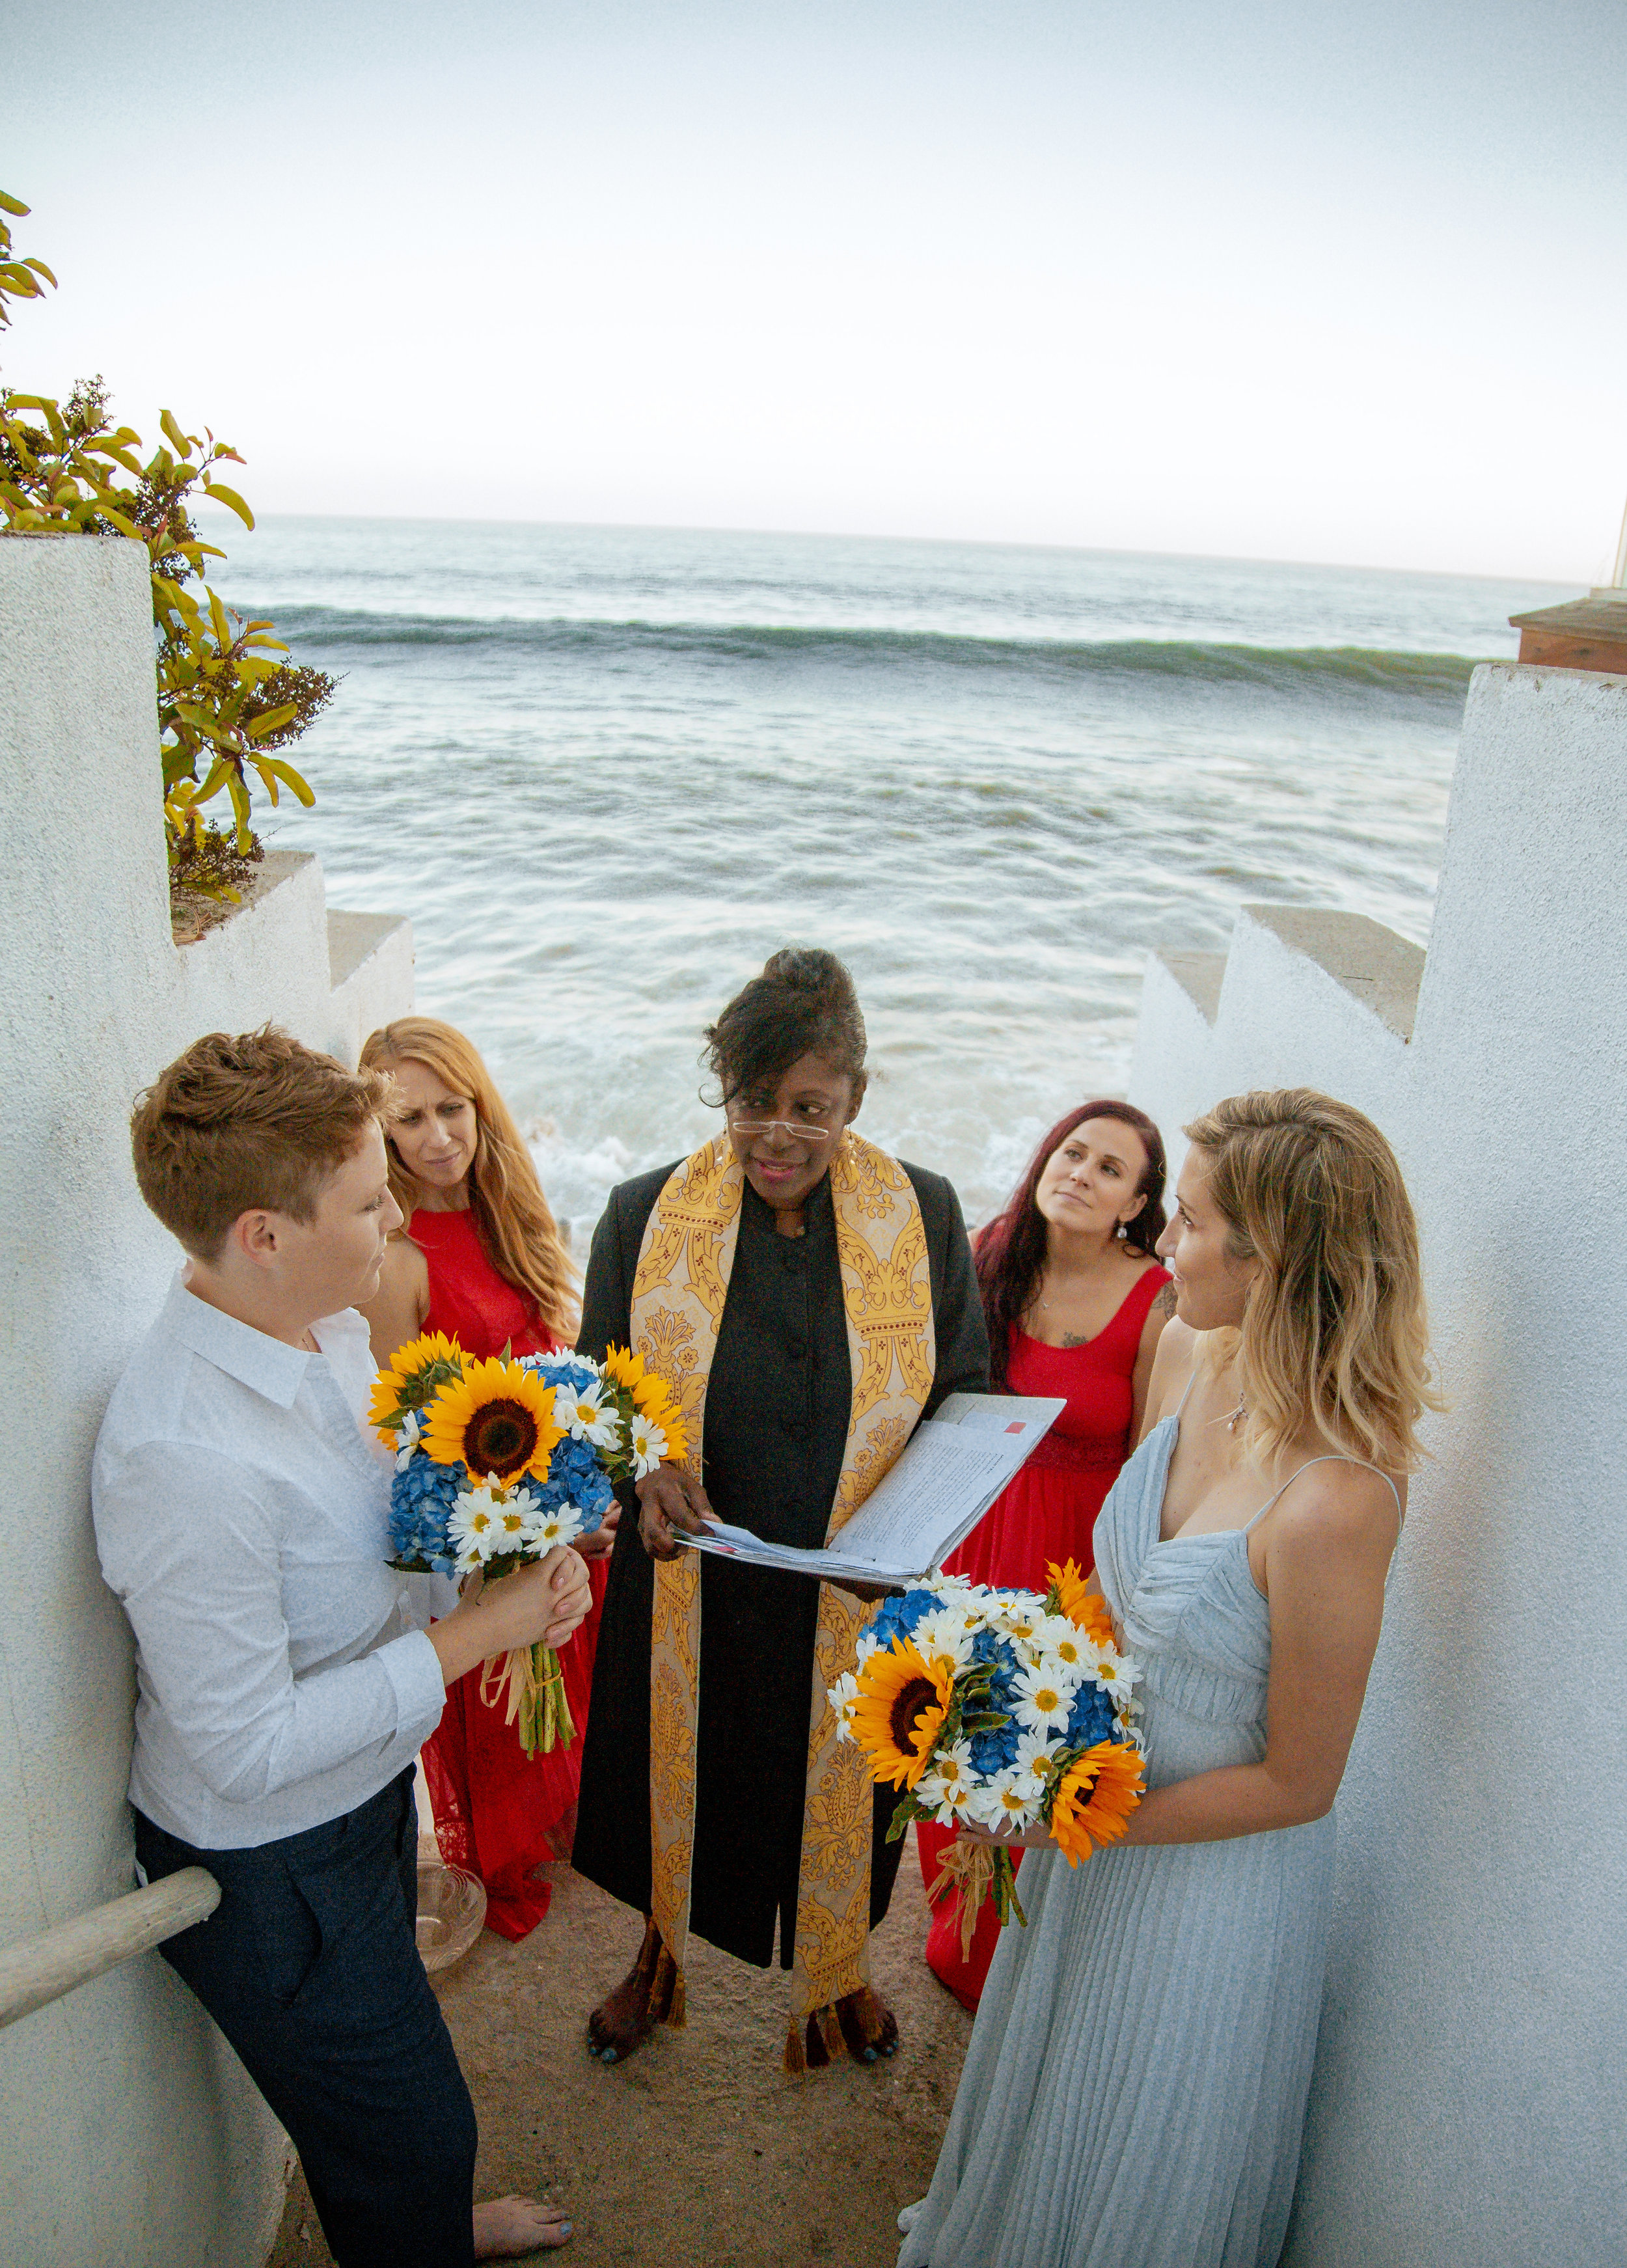 Hannah_&_Kates_Wedding_Oct_5th_2018_0_32.JPG